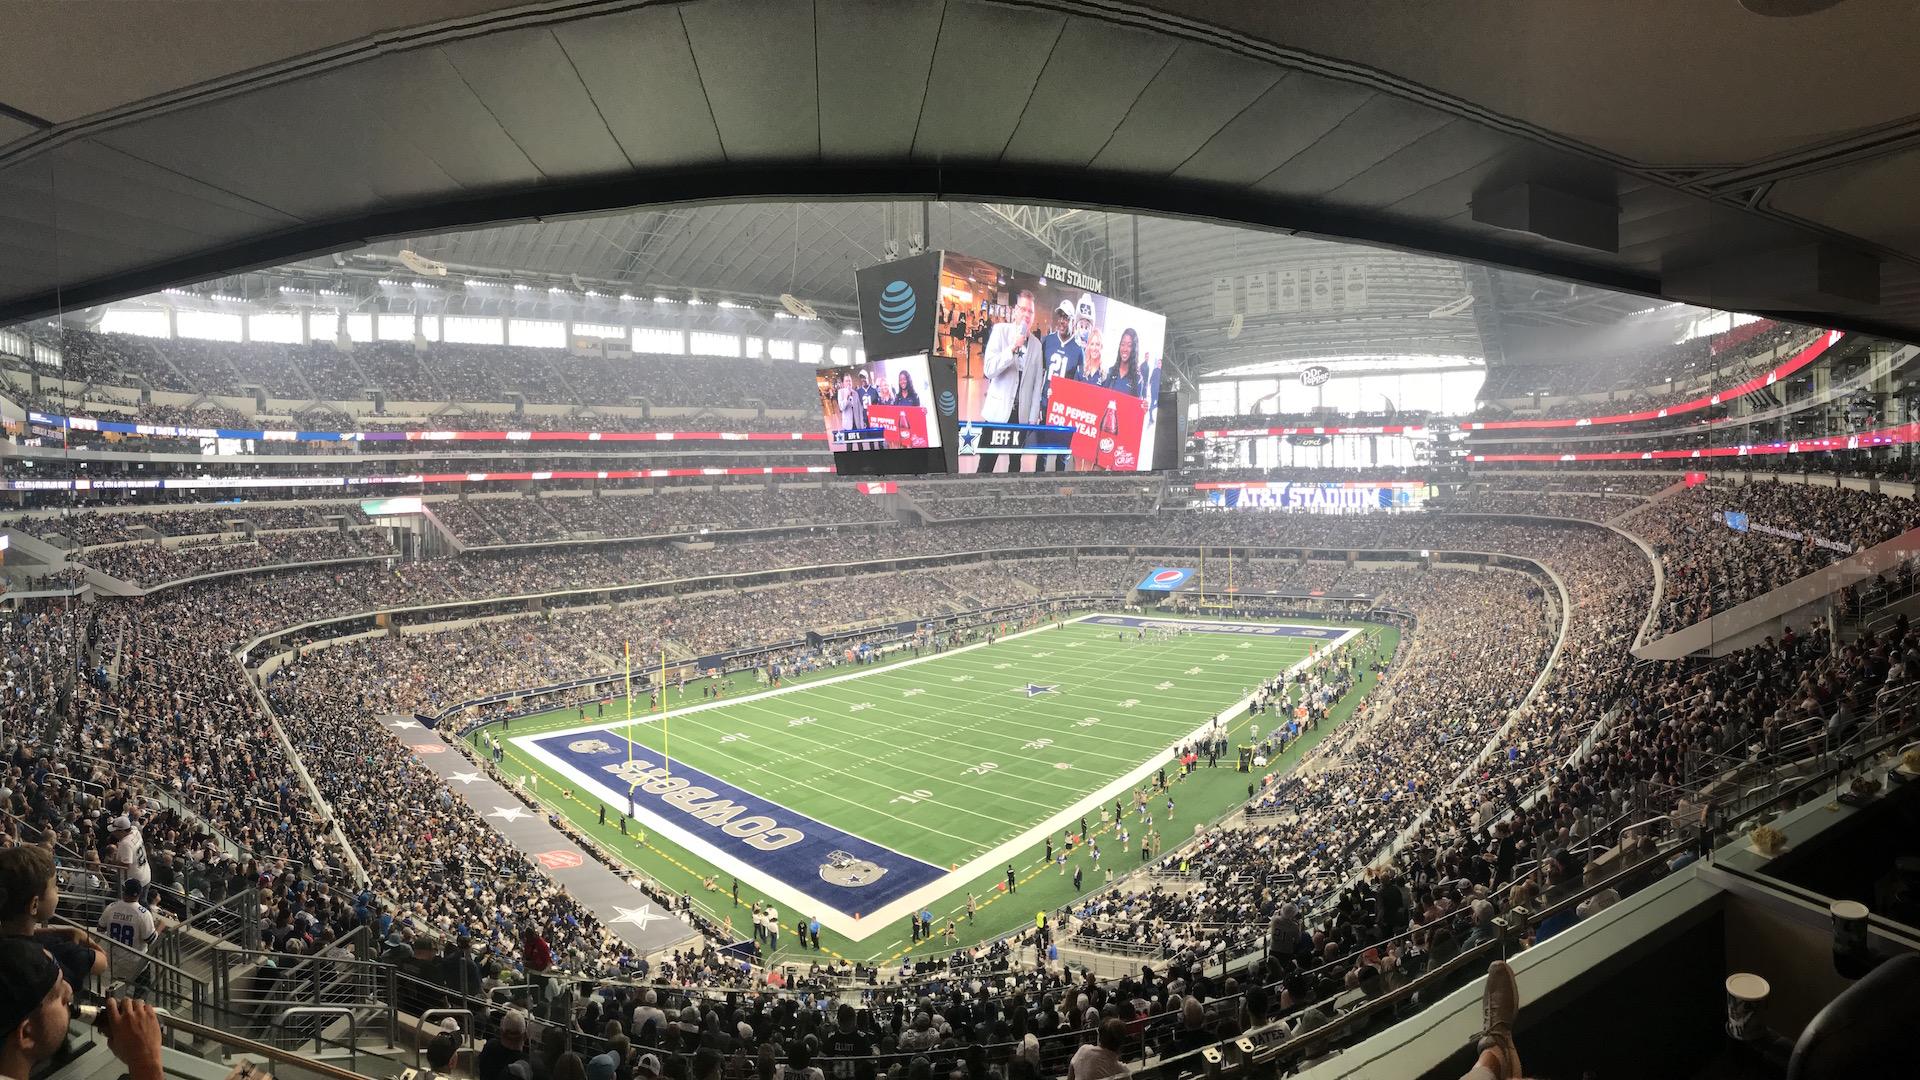 Experience a Cowboys game like a WinStar VIP!